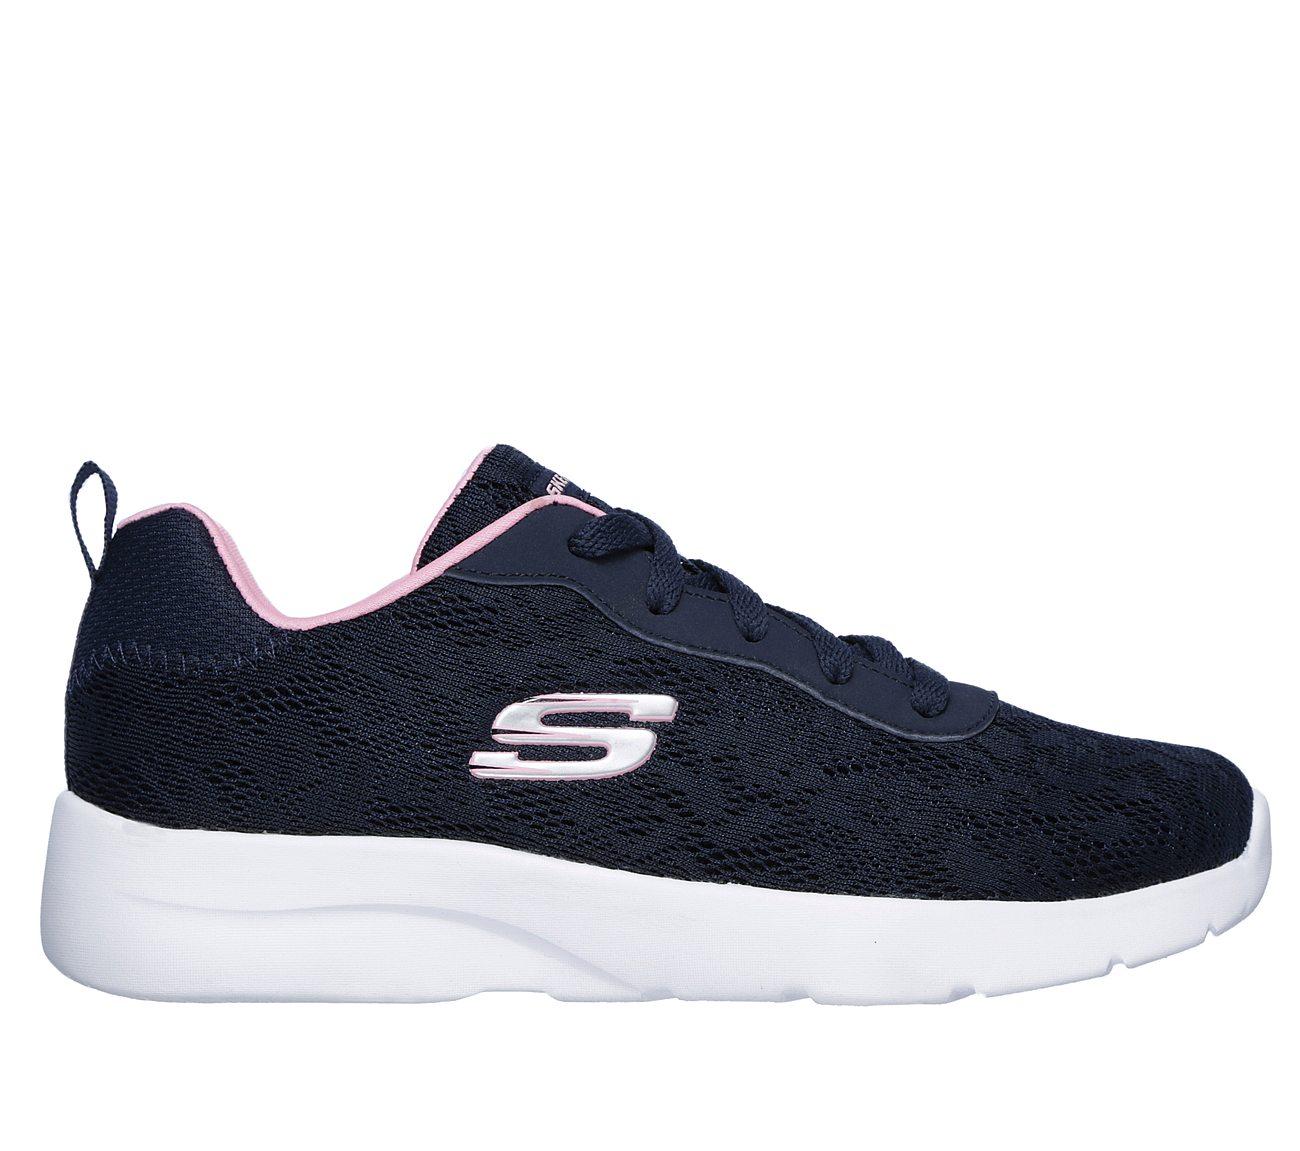 Buy SKECHERS Dynamight 2.0 Homespun SKECHERS Sport Shoes